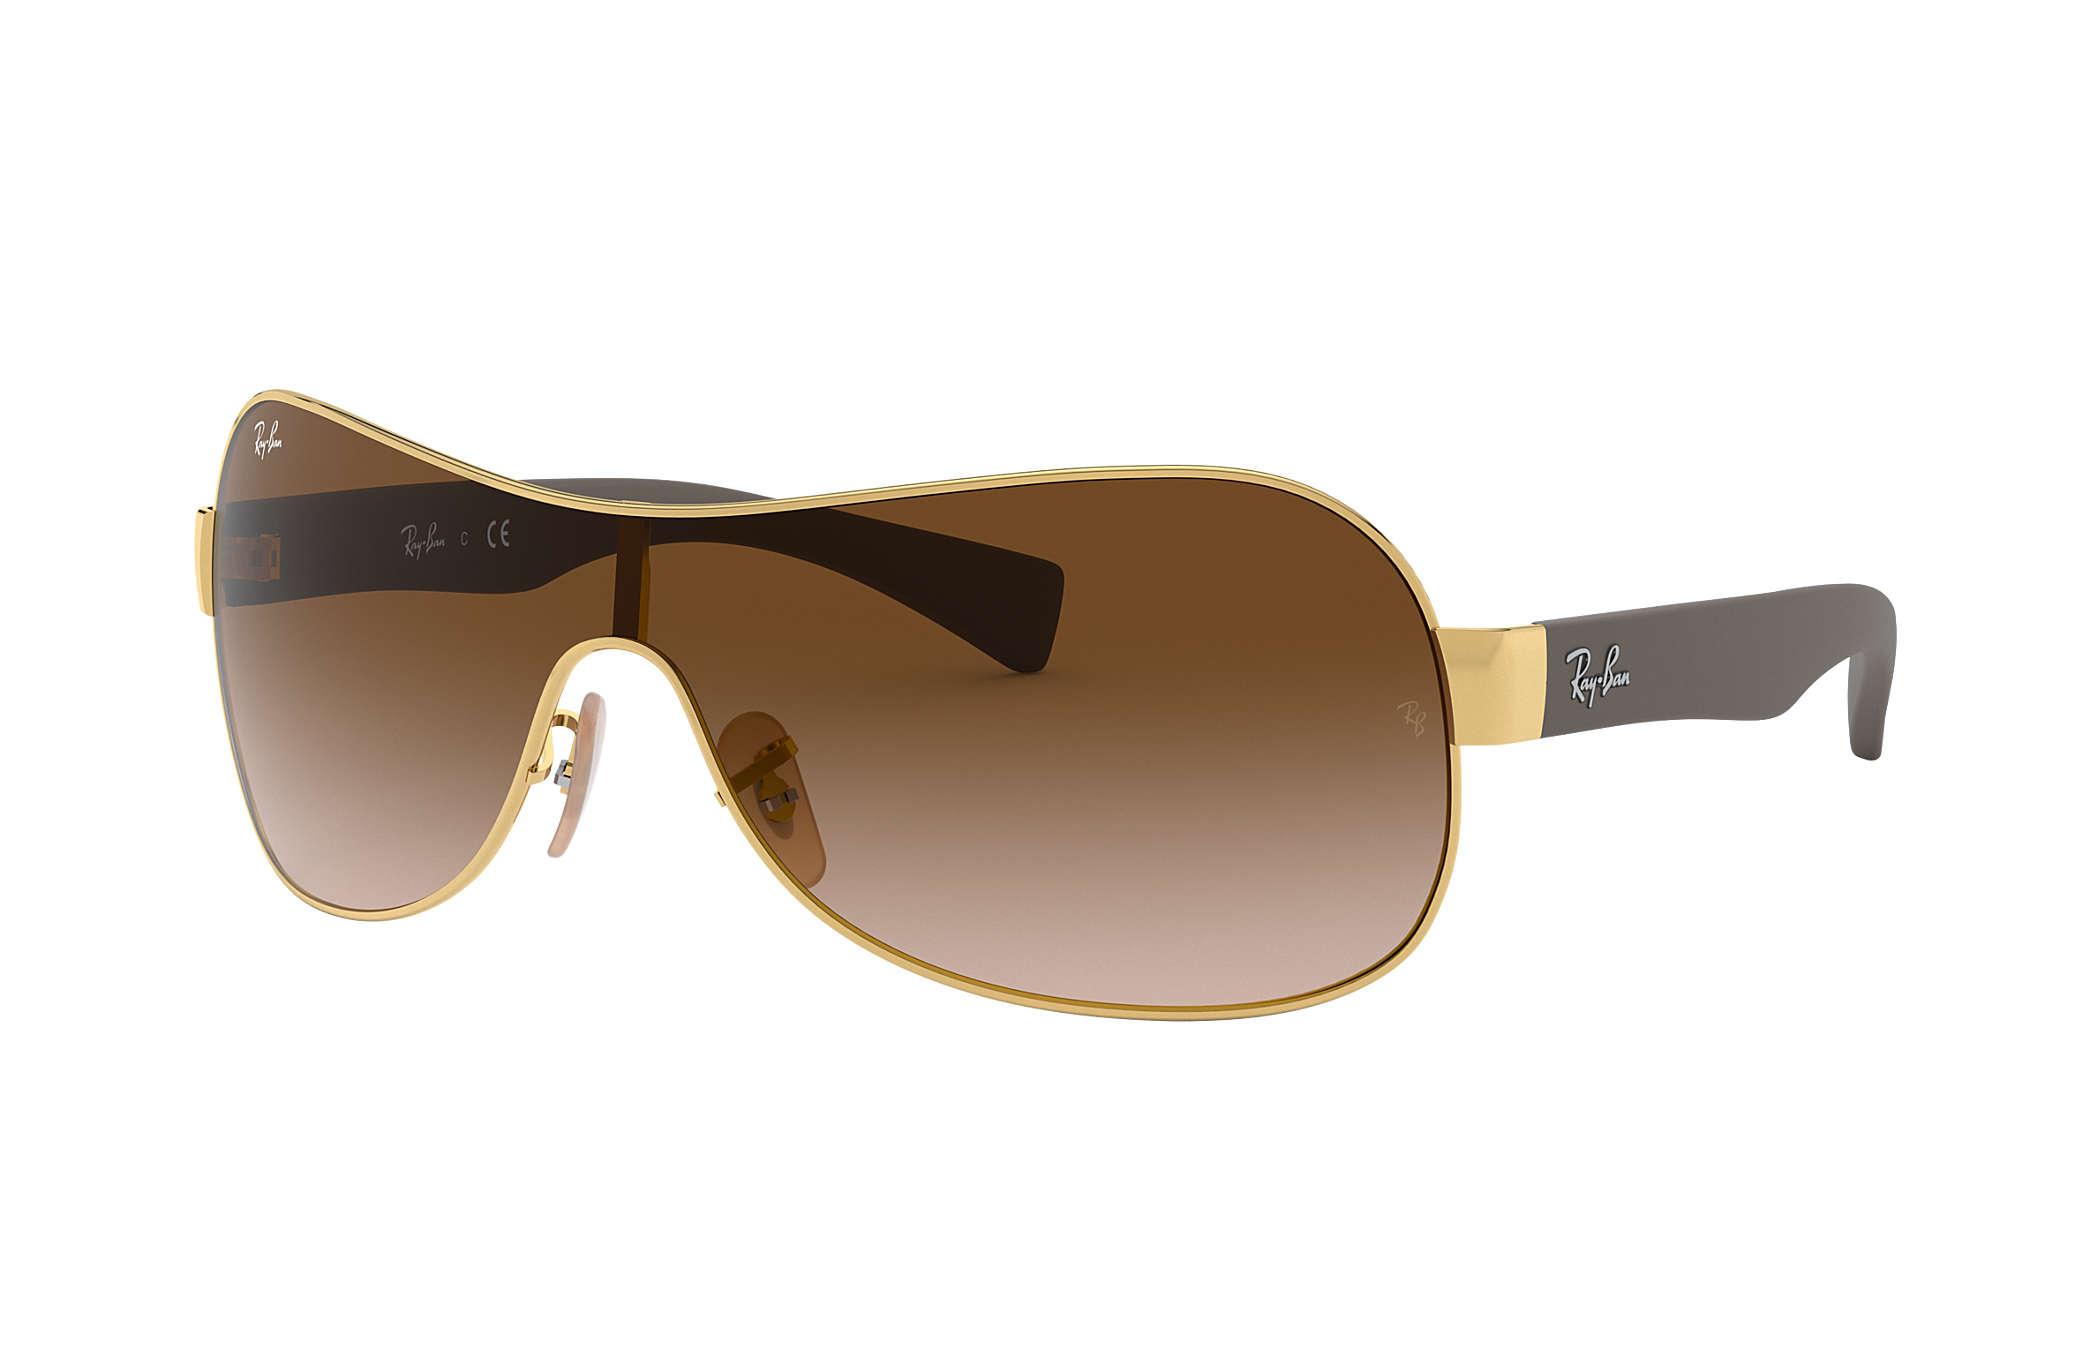 3b4c028c65 Ray-Ban RB3471 Gold - Metal - Brown Lenses - 0RB3471001 1332